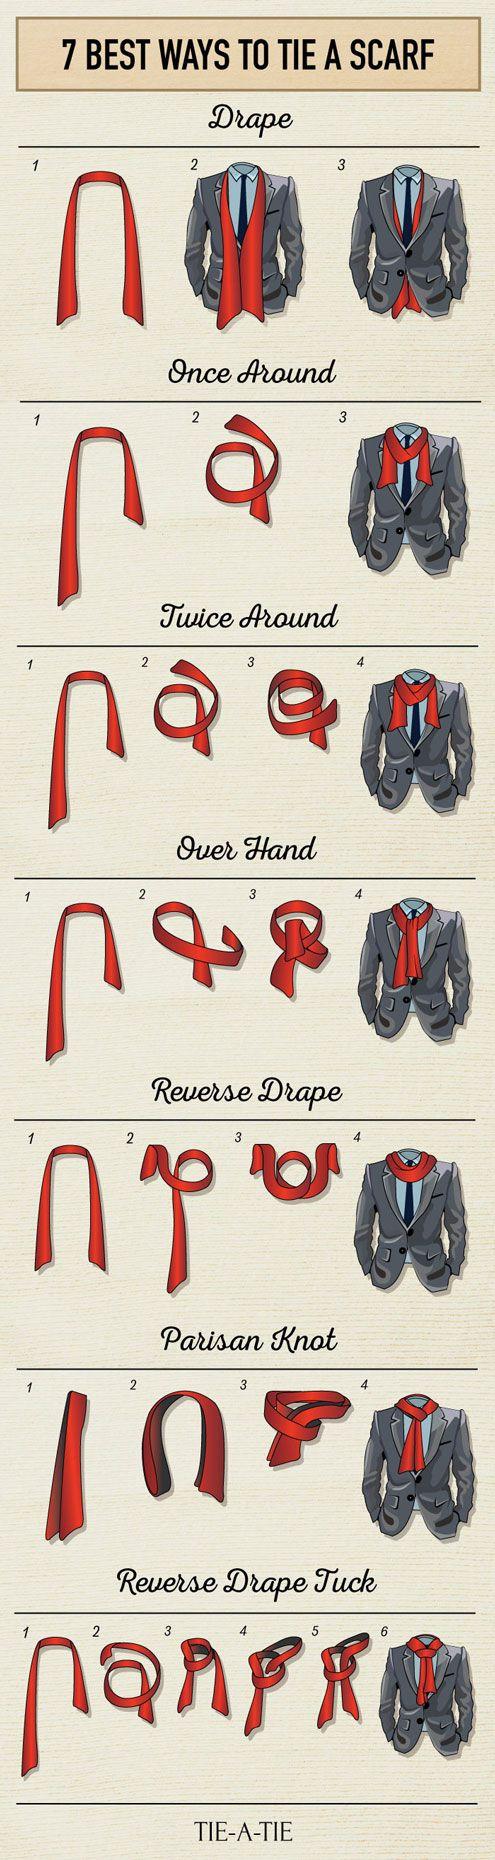 bows-n-ties:  The 7 Best Ways to Tie a Scarf in Menswear - (source: Tie-a-Tie.net)